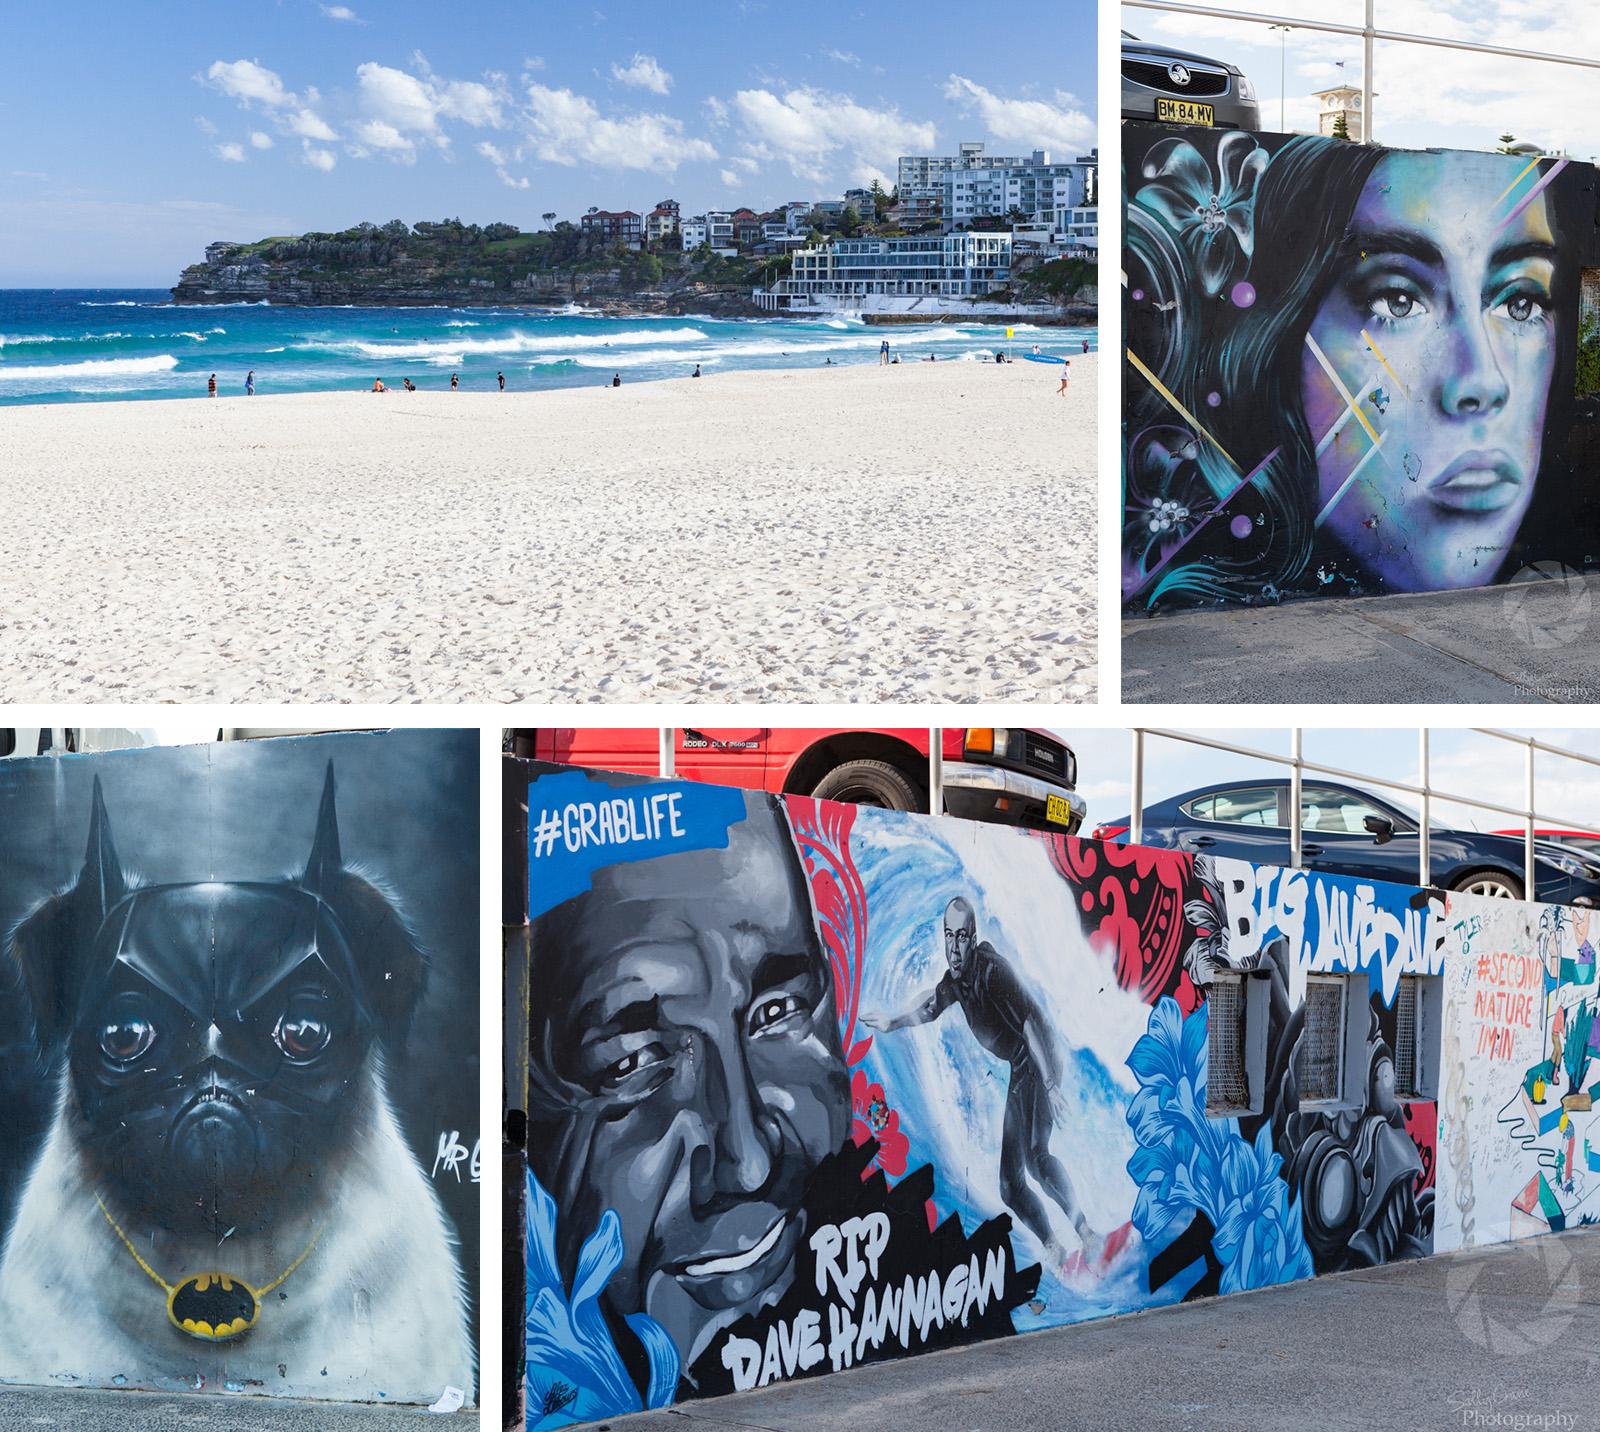 sally_crane_travel_photographer_bondi_graffiti_wall.jpg